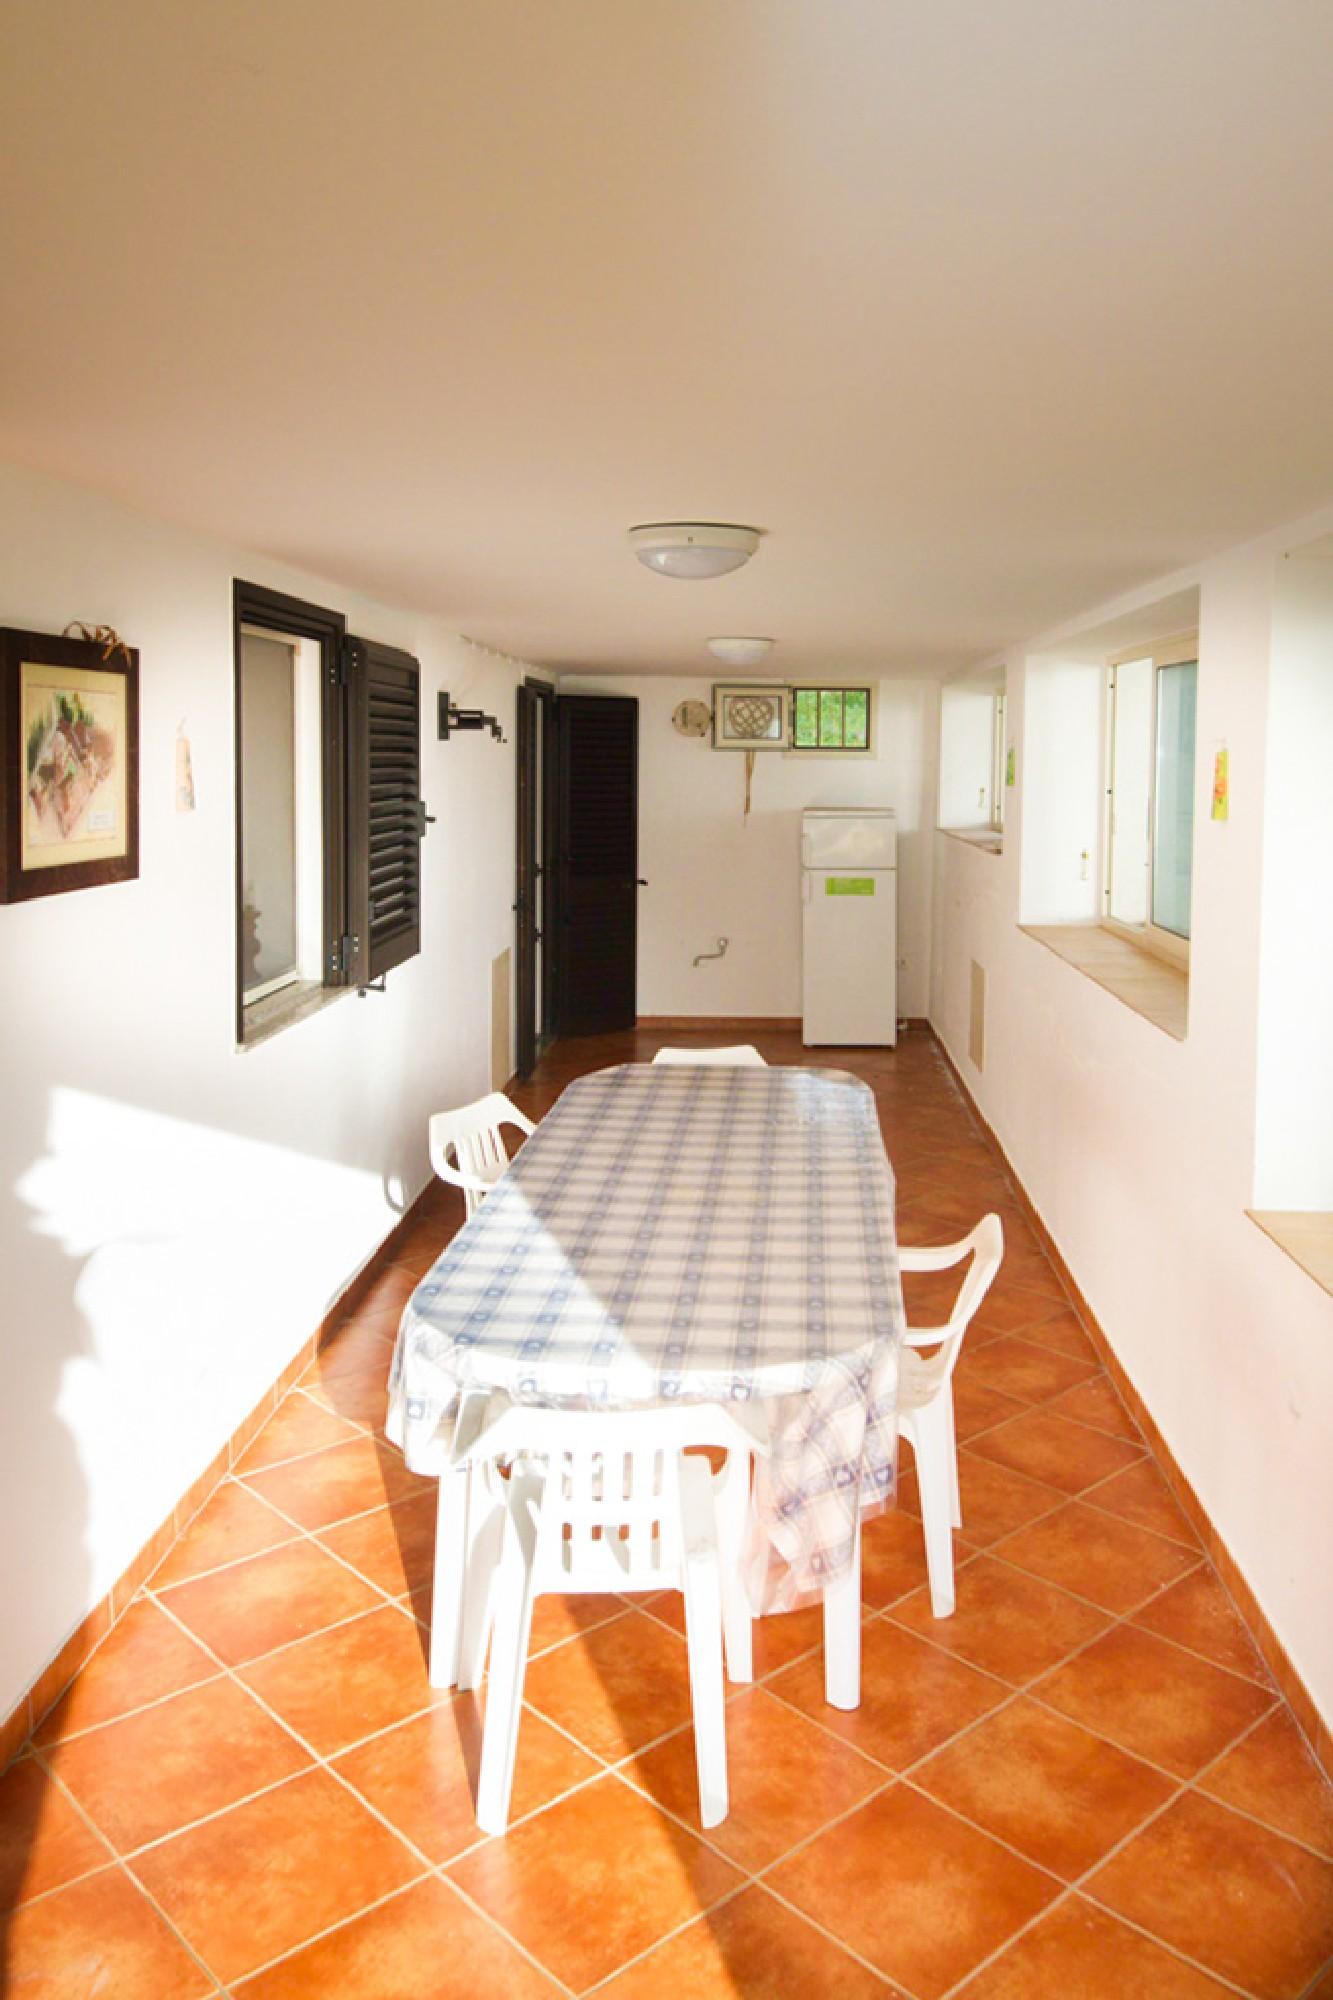 Apartment Apt Porticato 2 - Cantoru photo 24289672